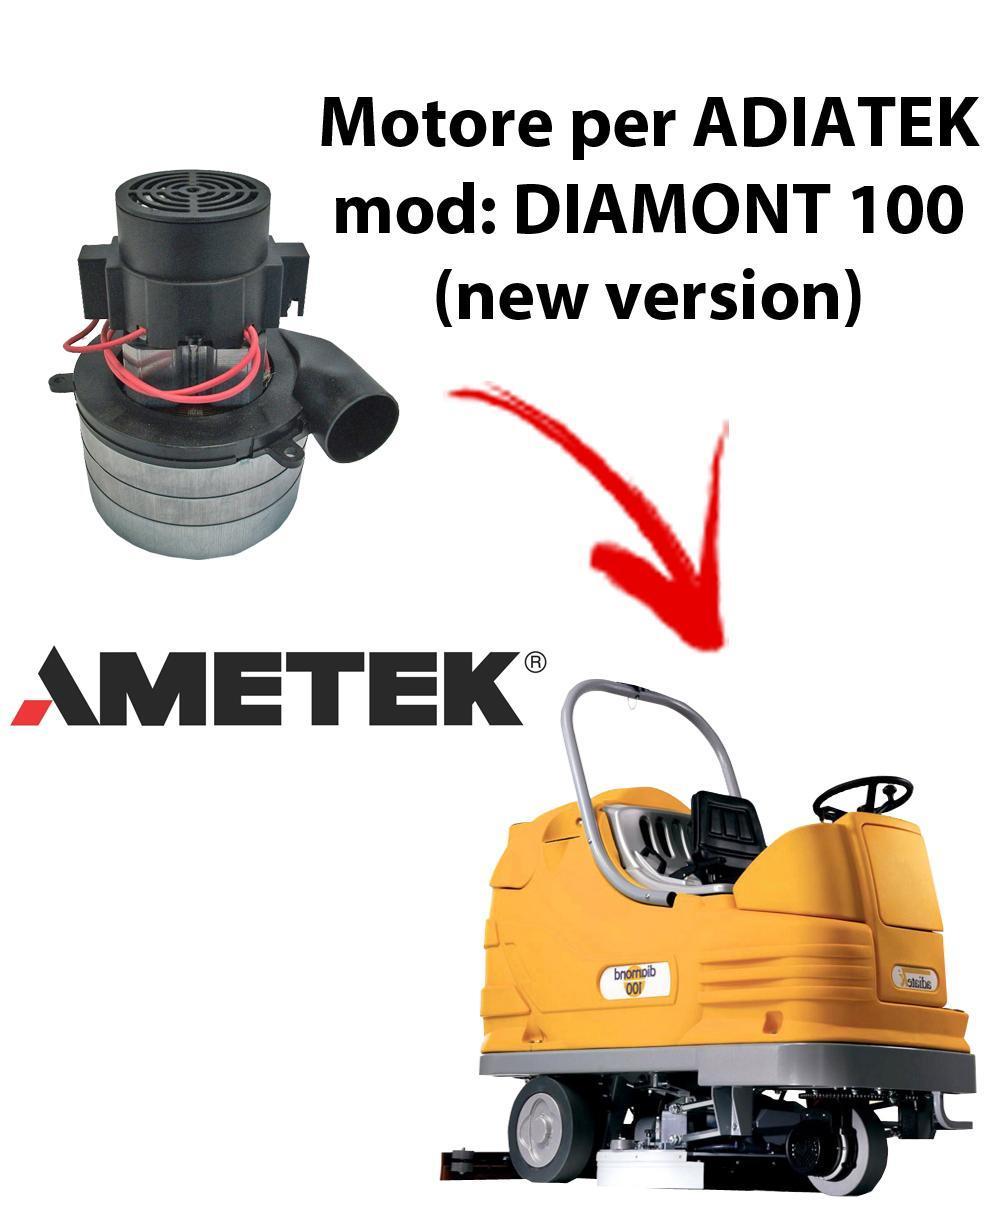 Diamond 100 (new version) Vacuum motors AMETEK Italia for scrubber dryer Adiatek